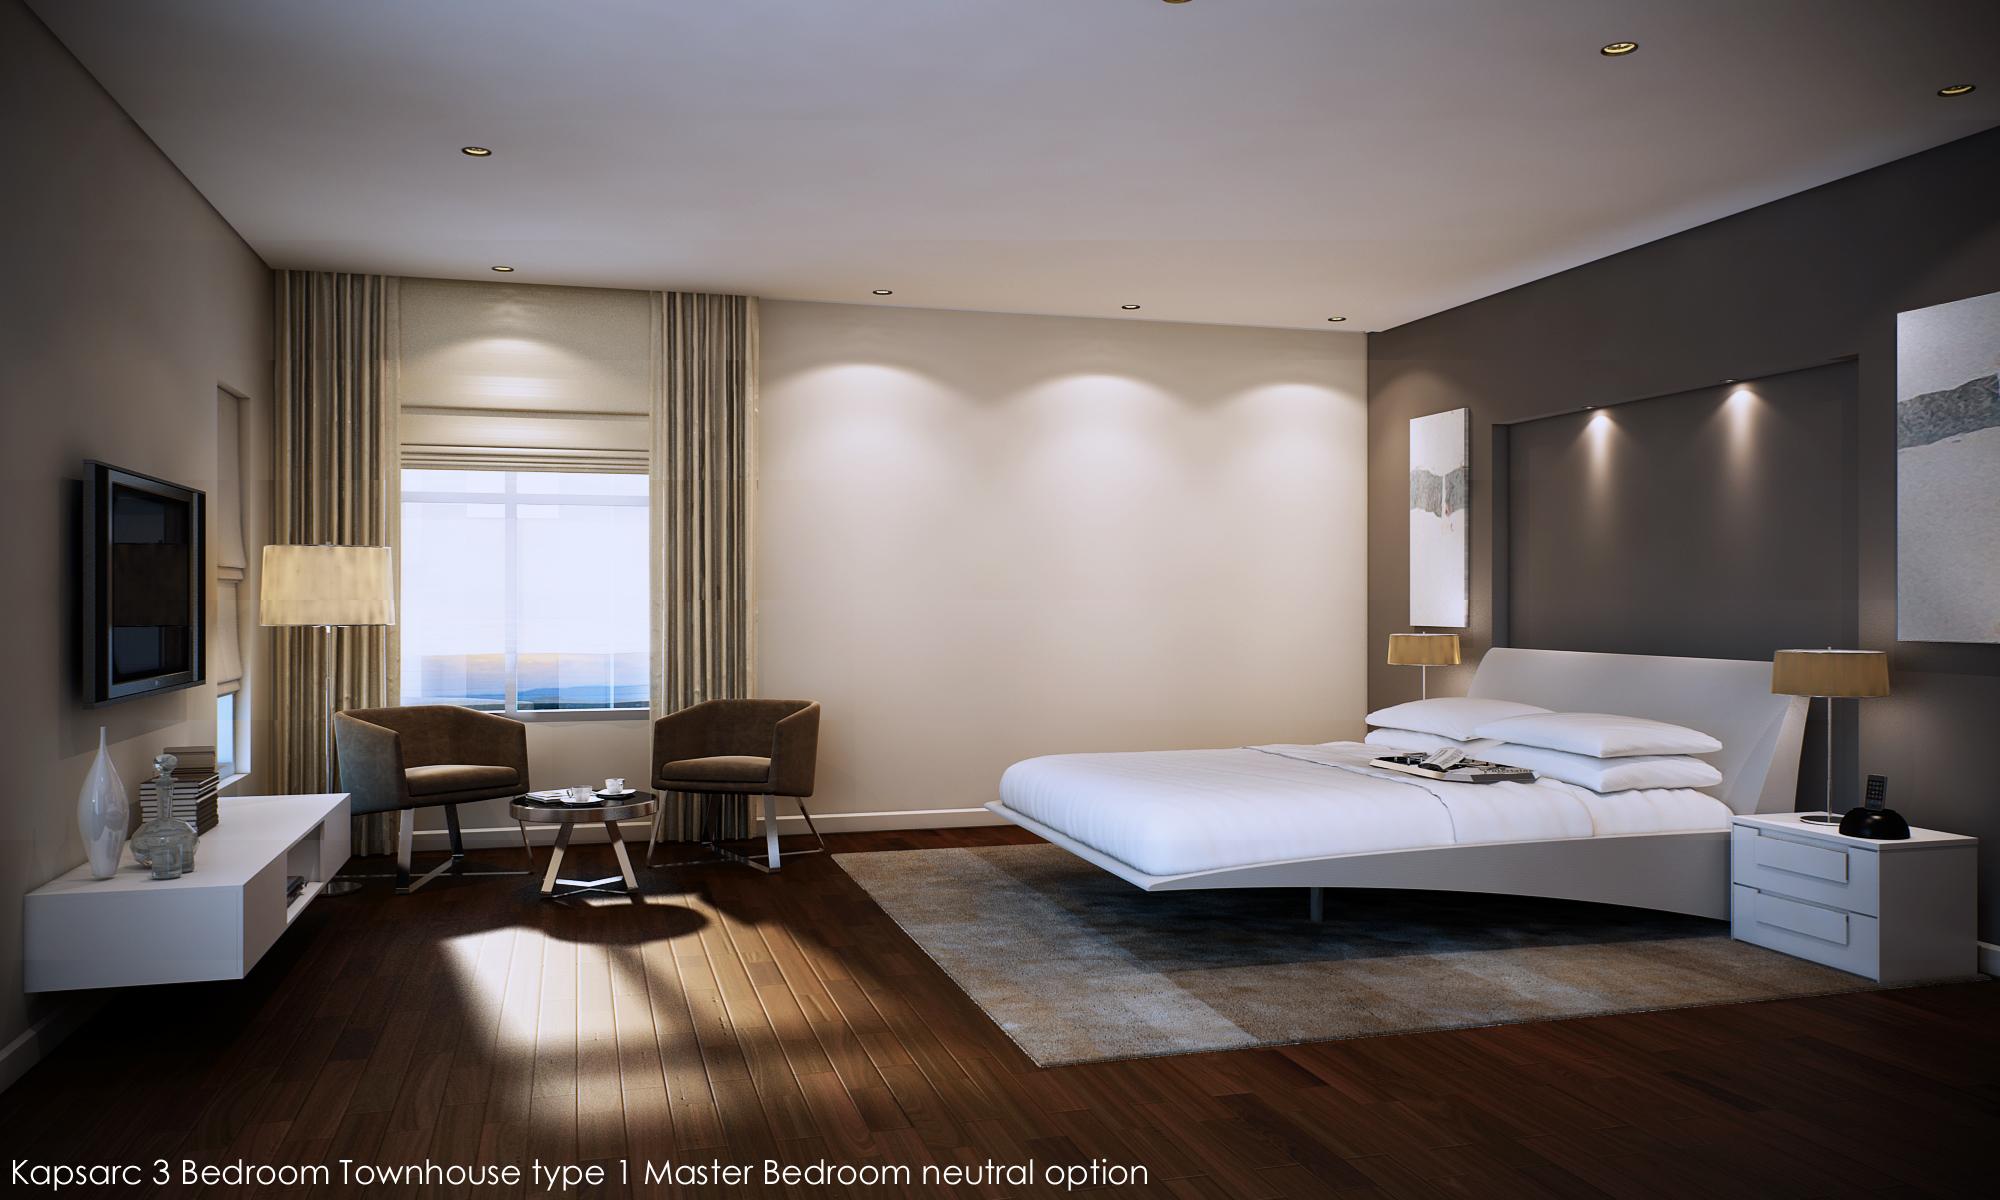 Kapsarc 3 Bedroom Townhouse type 1 Master Bedroom neutral op.jpg